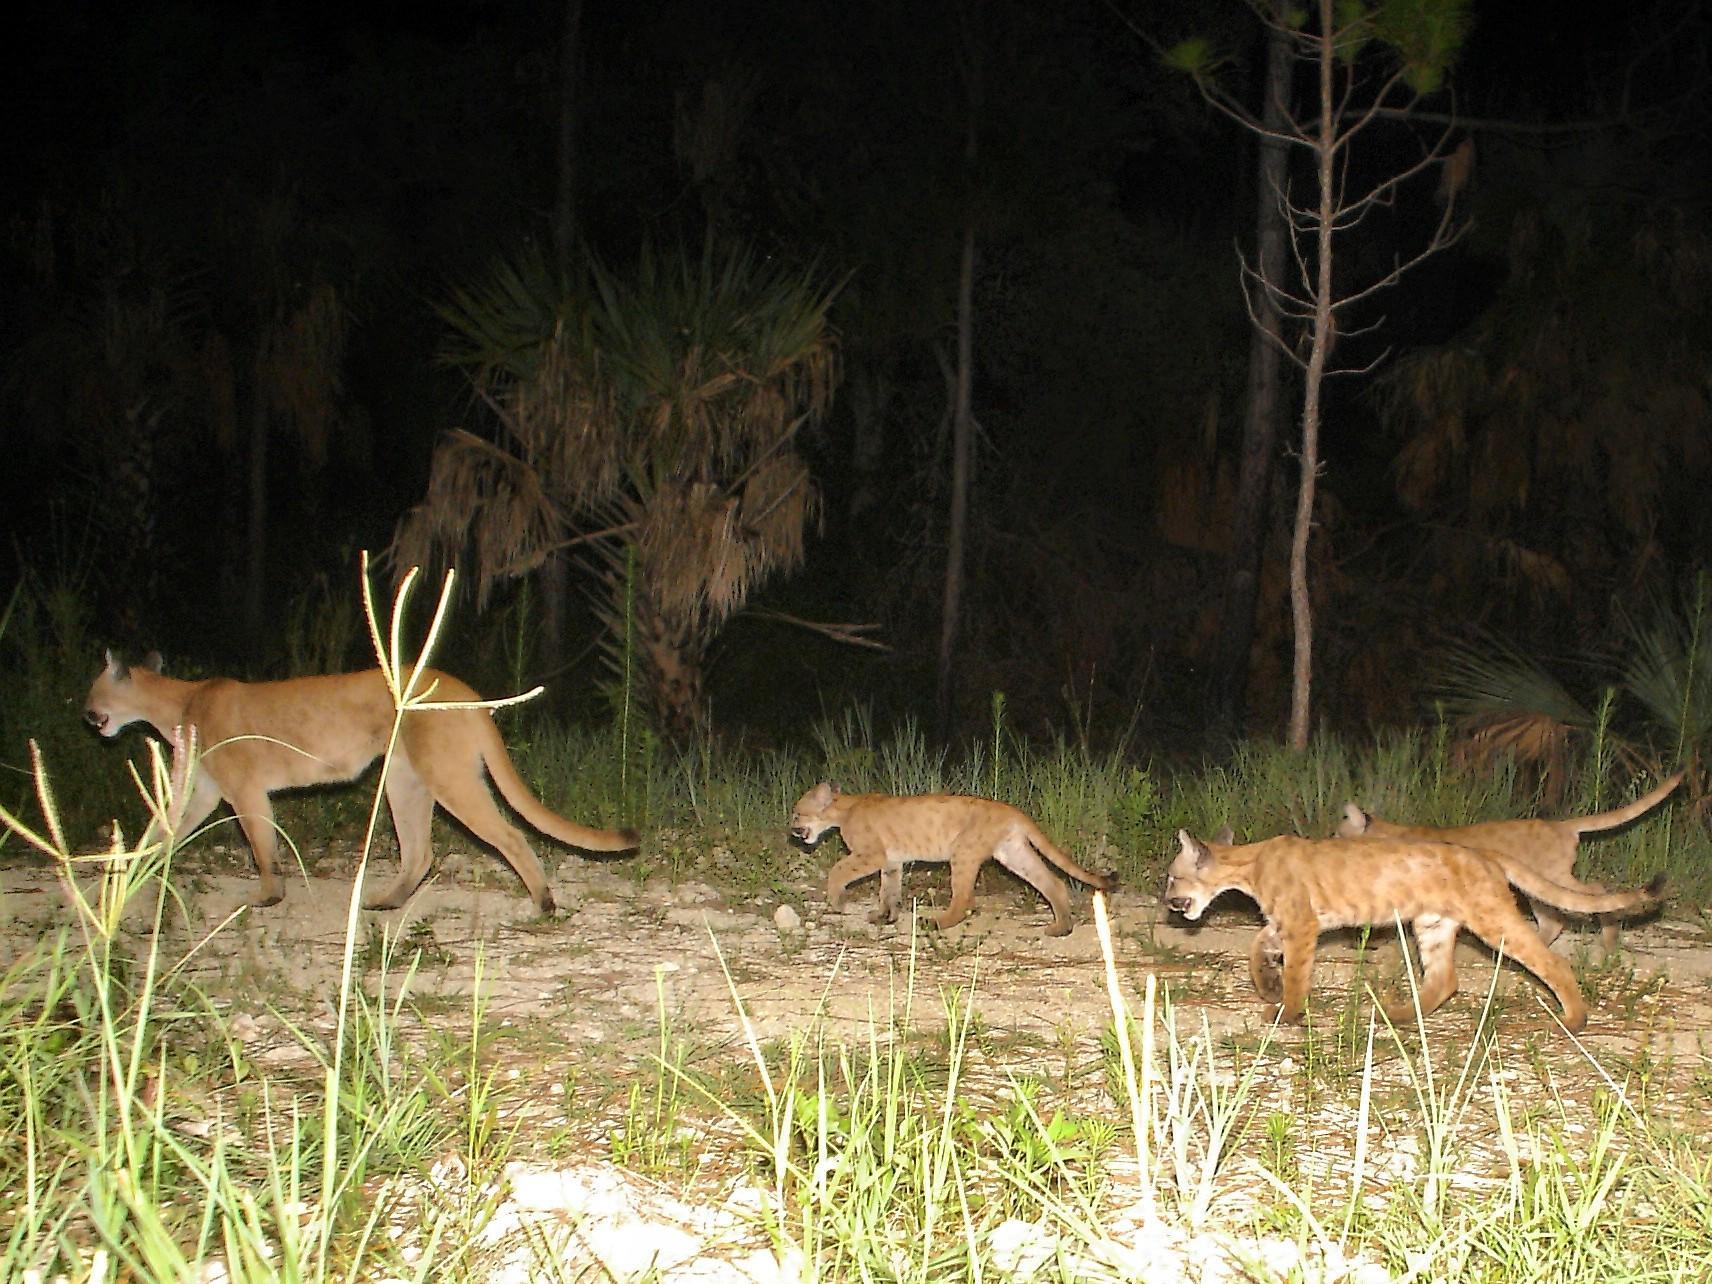 Florida S Purchase Of 10 Environmental Treasures Changed